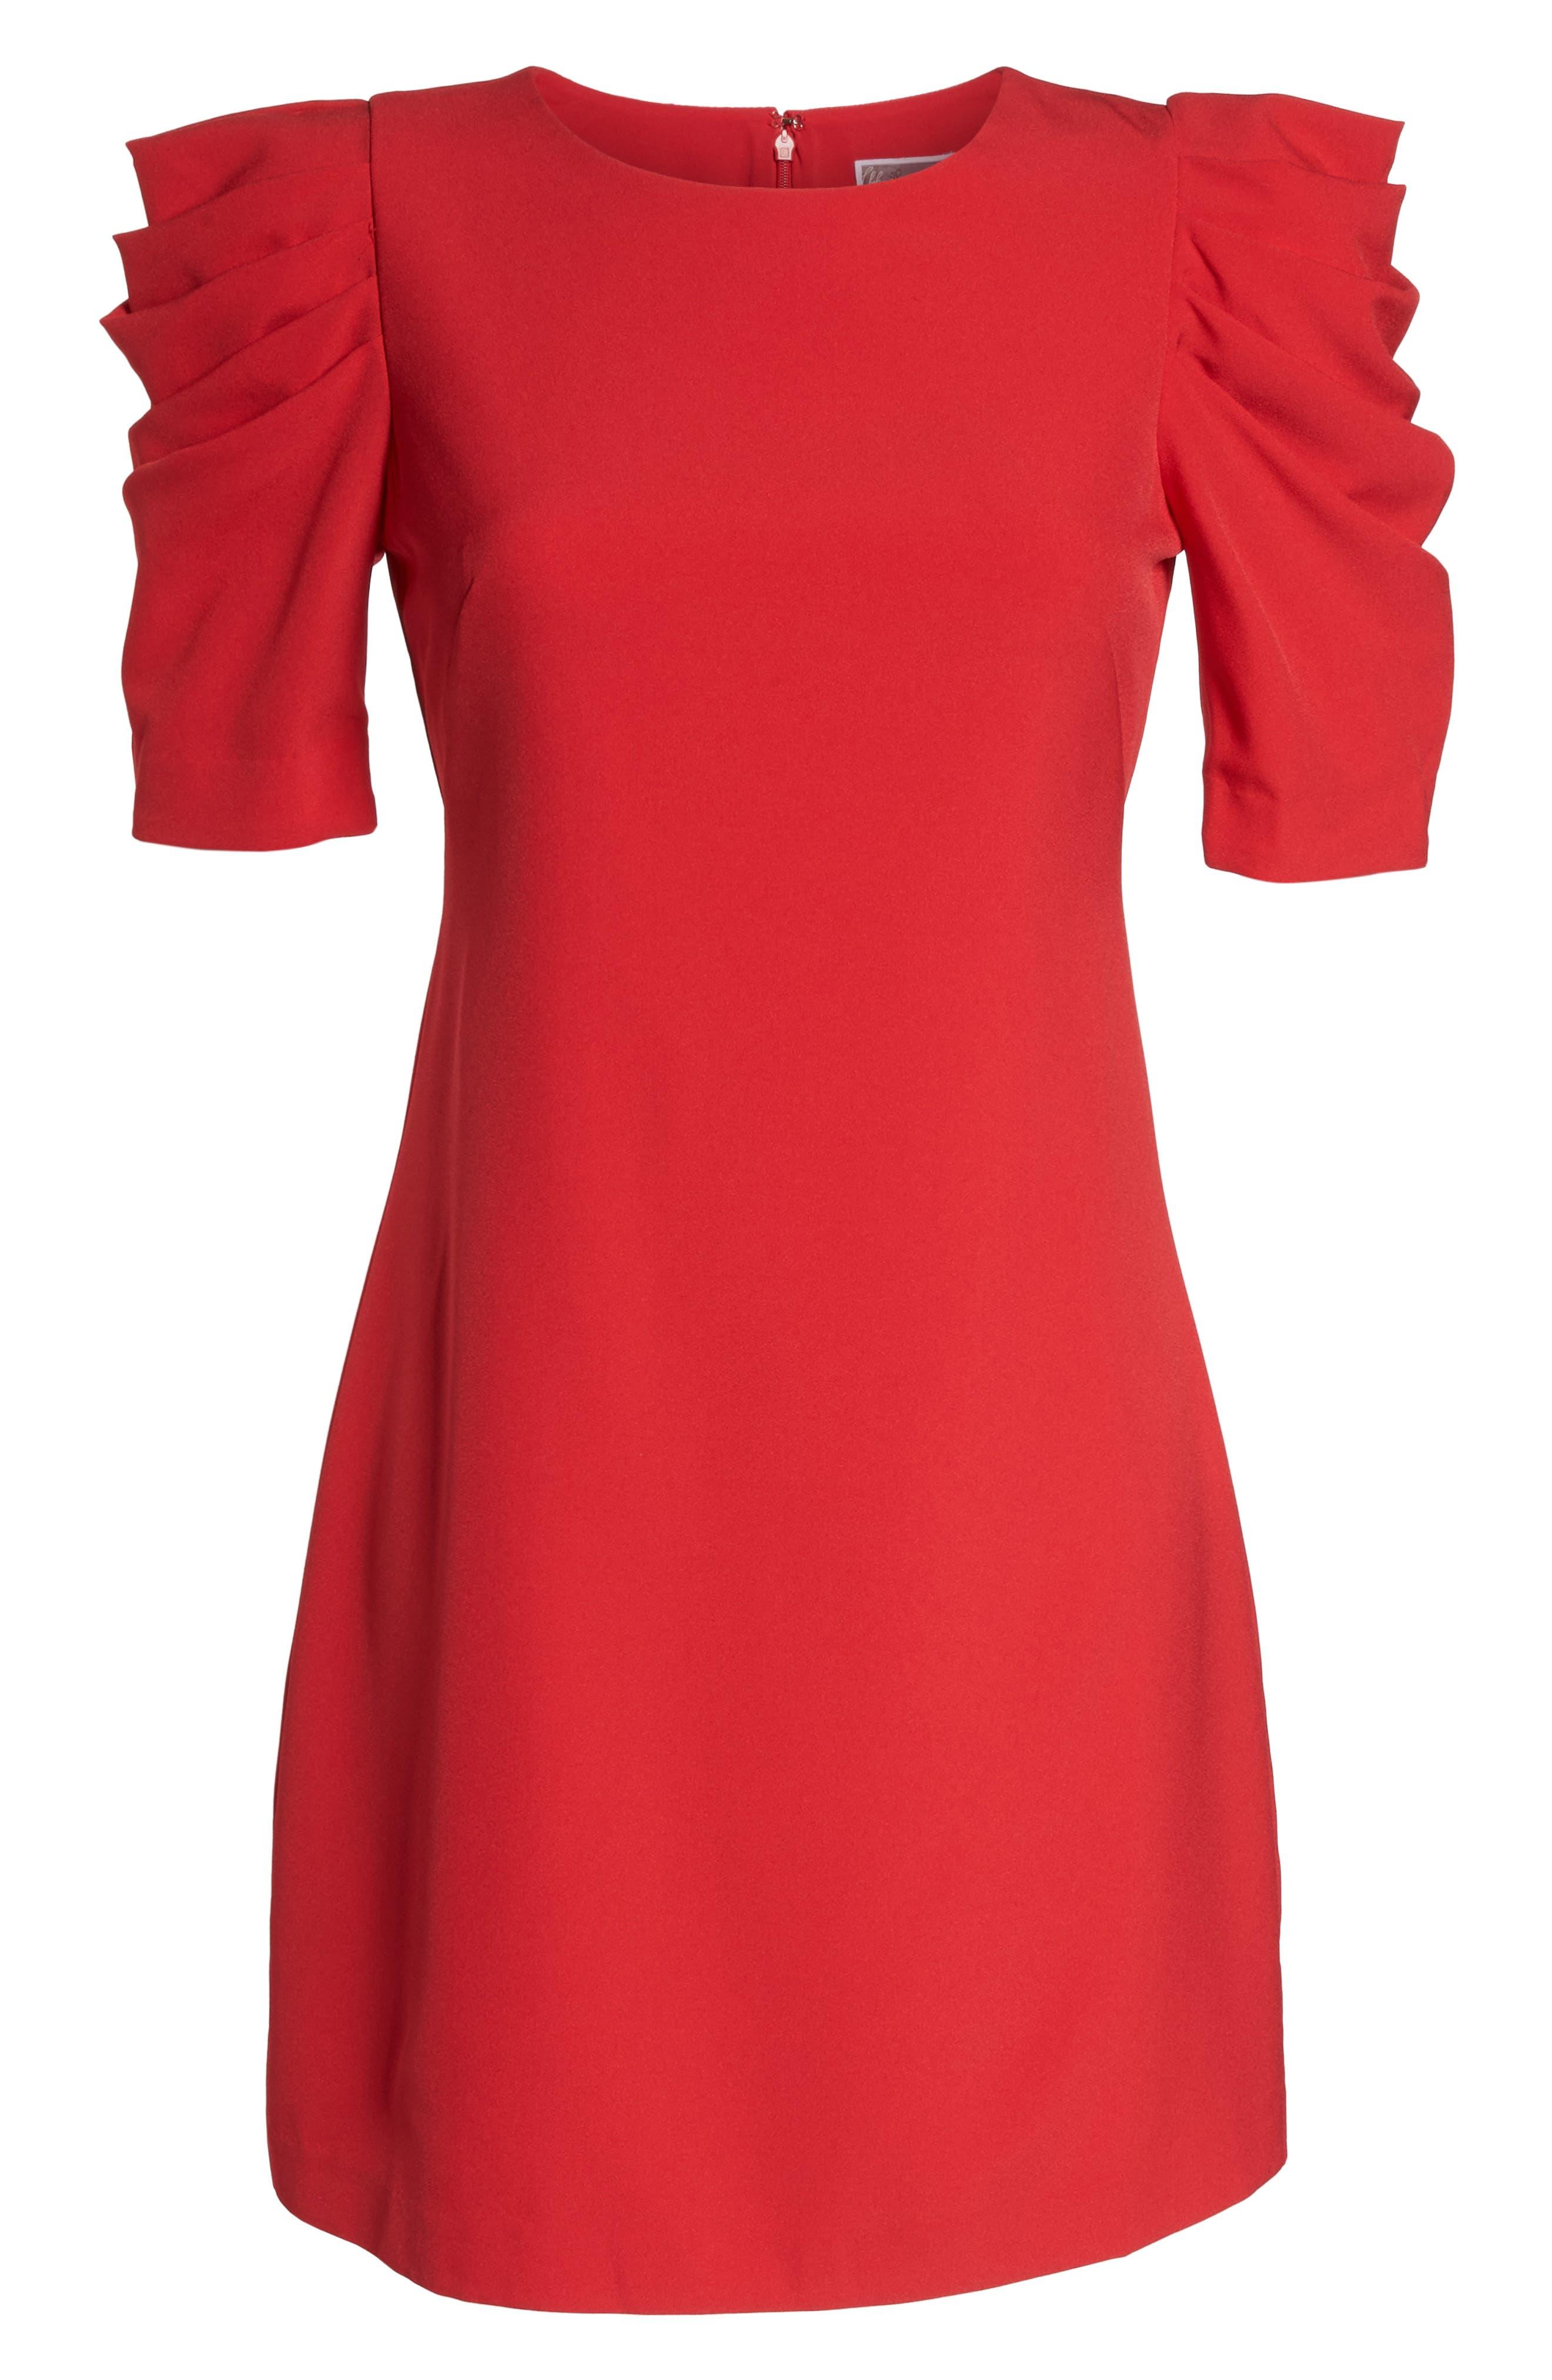 Puff Sleeve Shift Dress,                             Alternate thumbnail 7, color,                             Red Festive